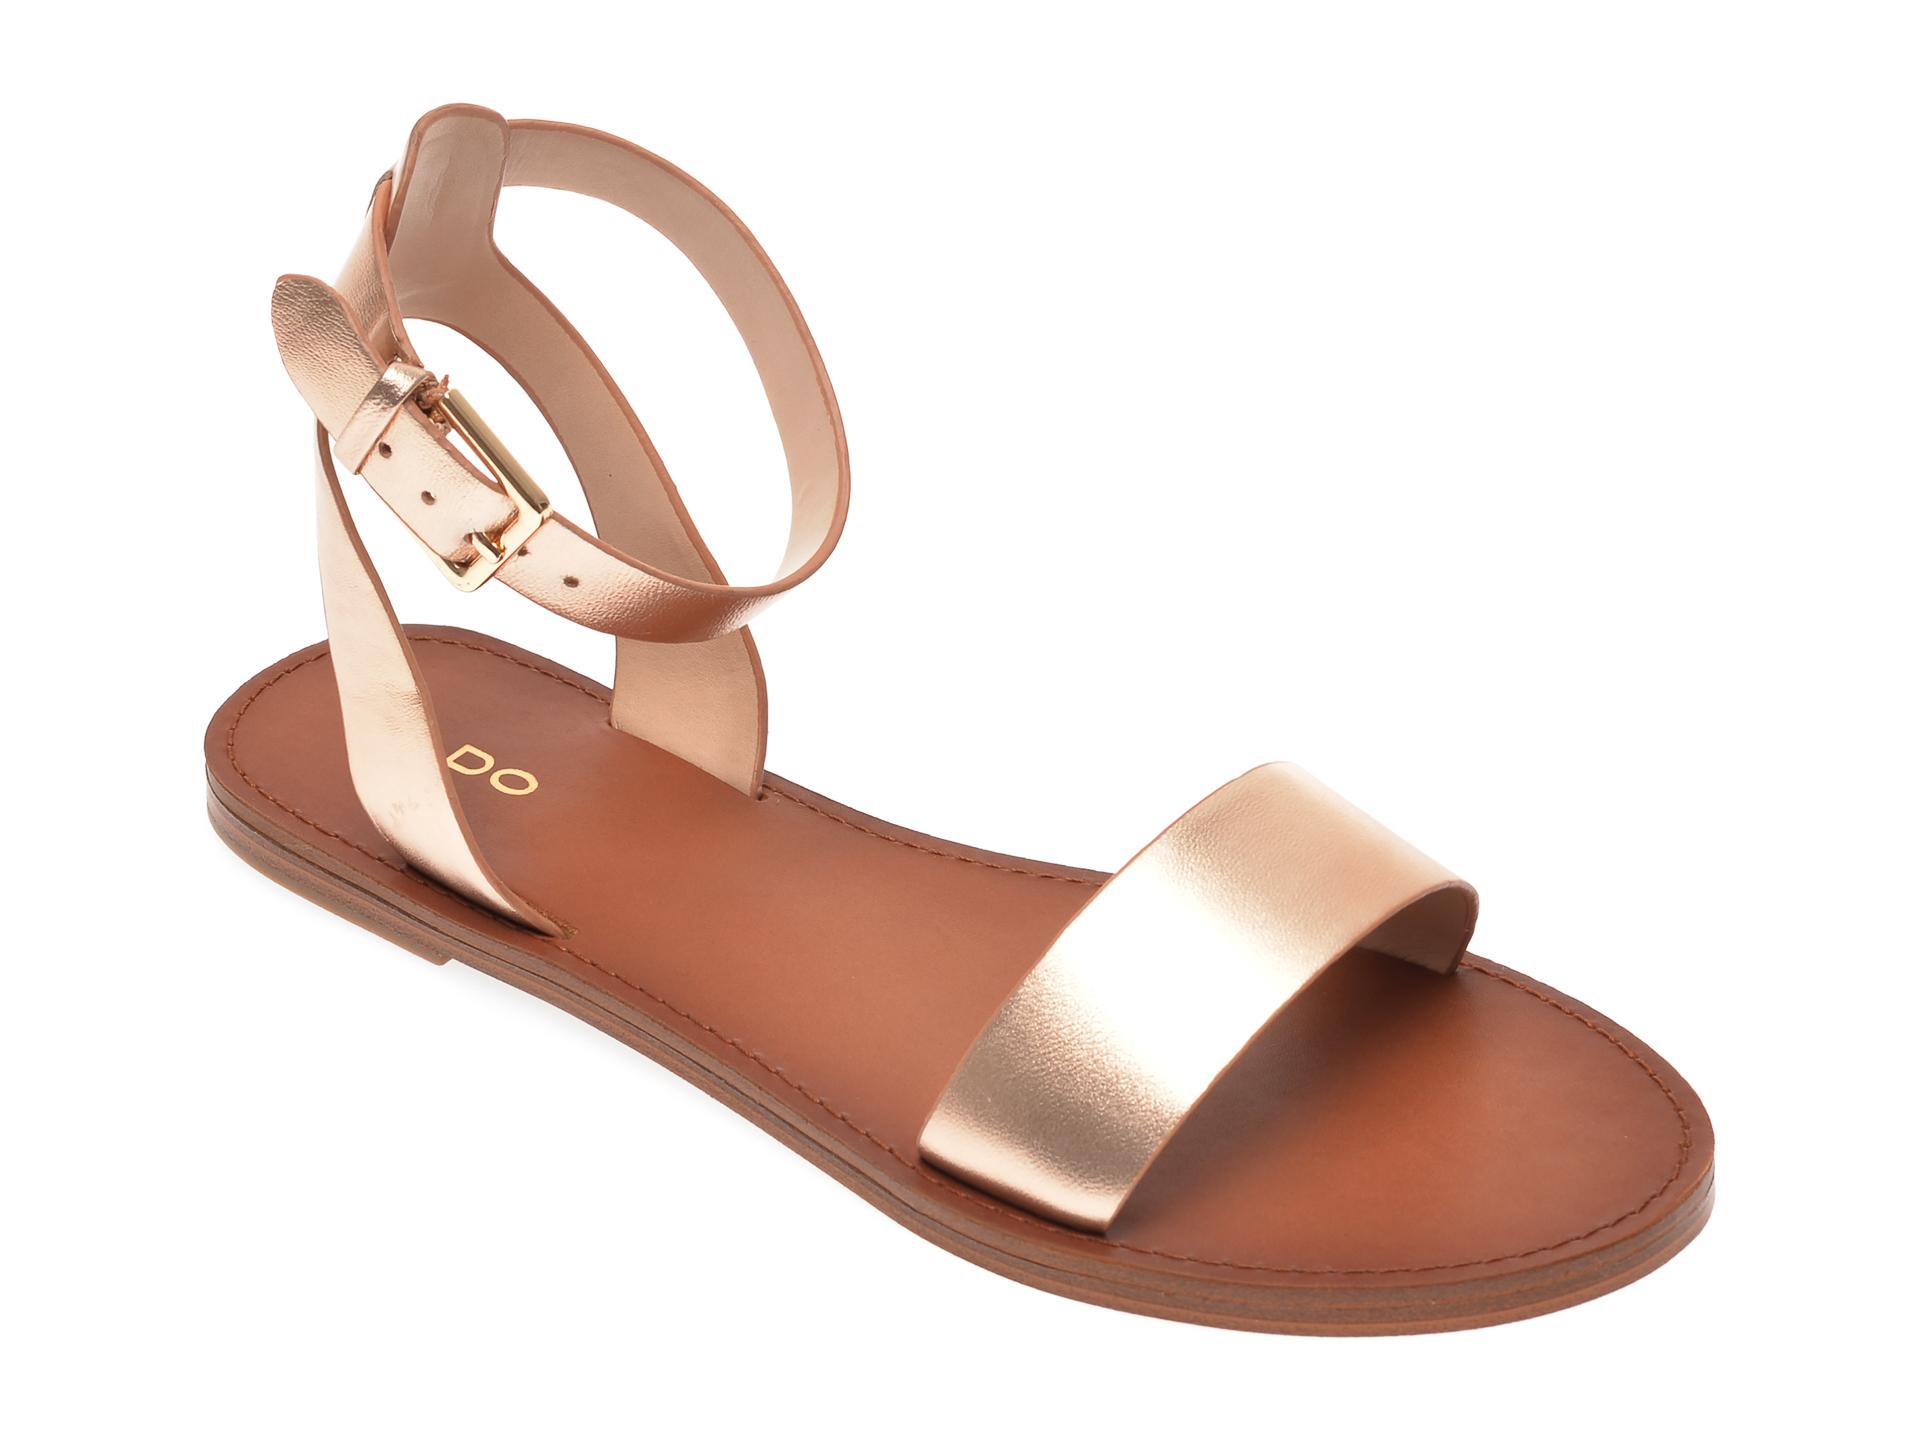 Sandale ALDO aurii, Campodoro962, din piele naturala